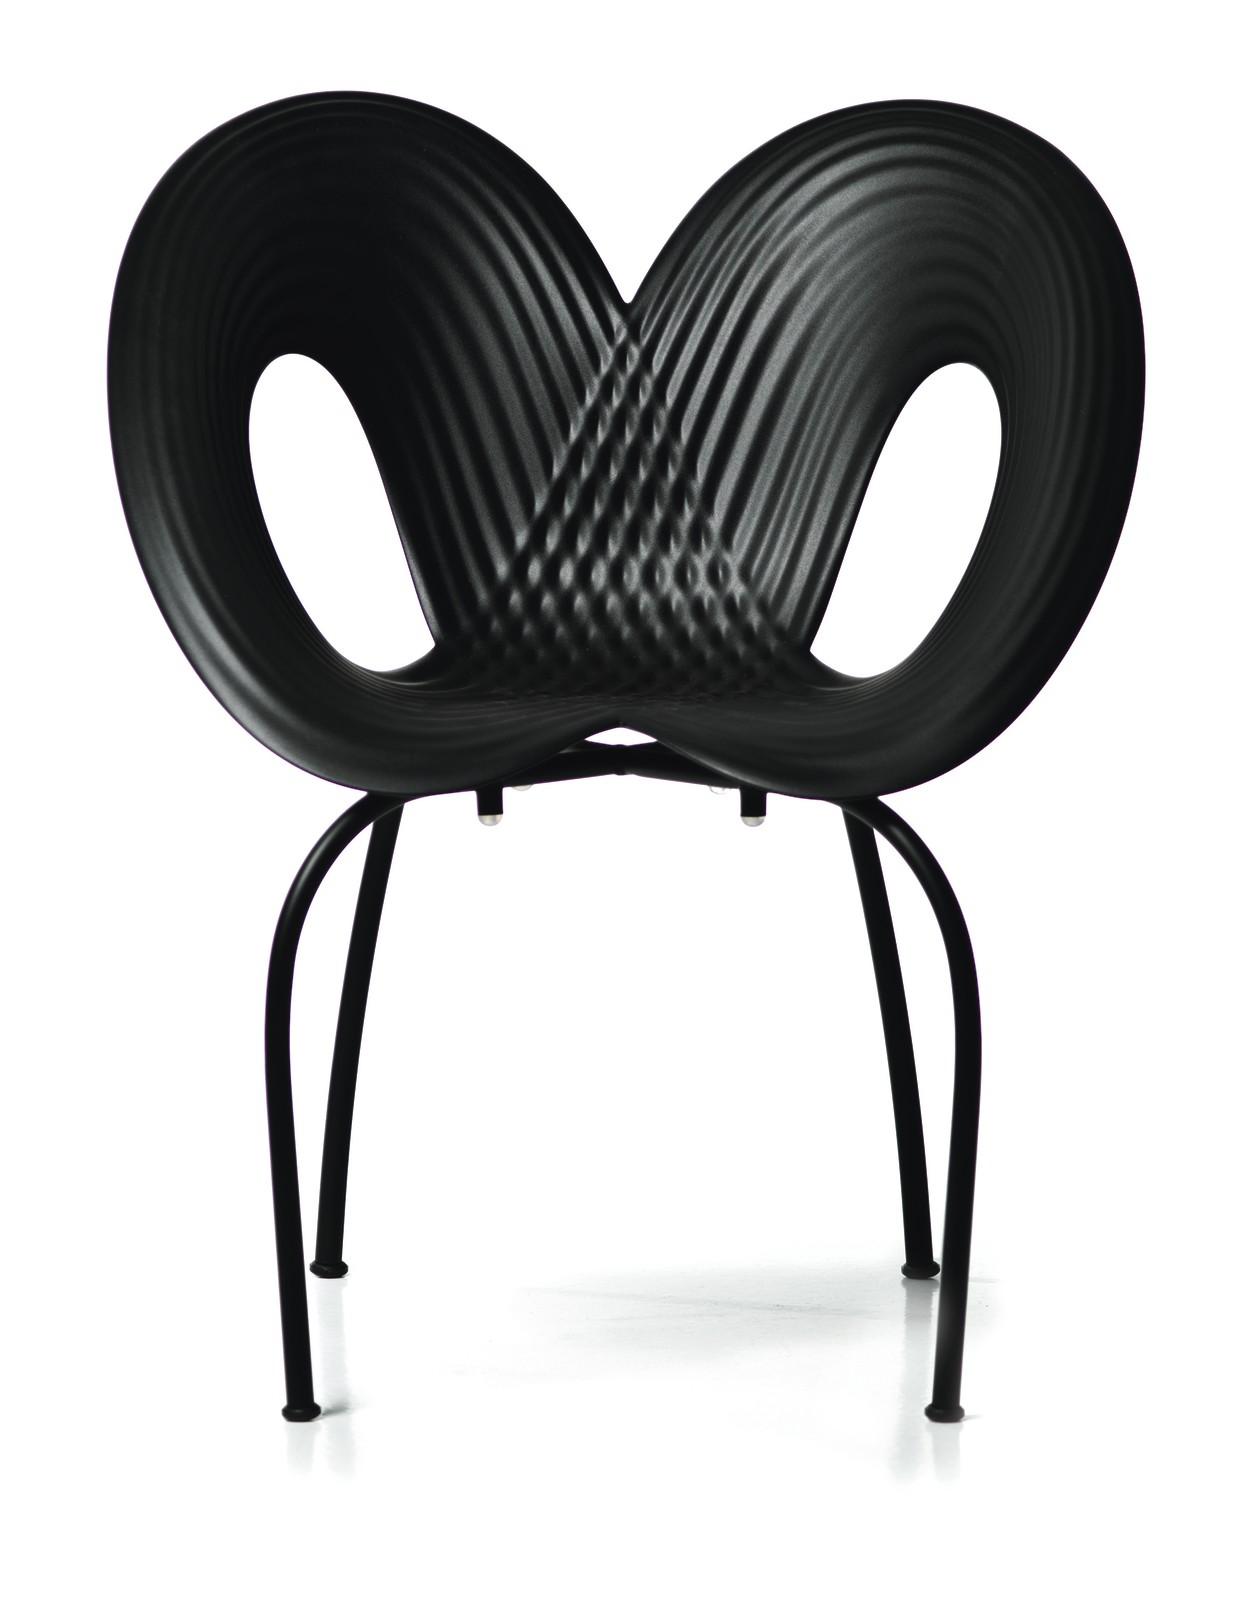 Ripple Set of 2 Dining Chairs Carbon Black Shell, Black Matt Base